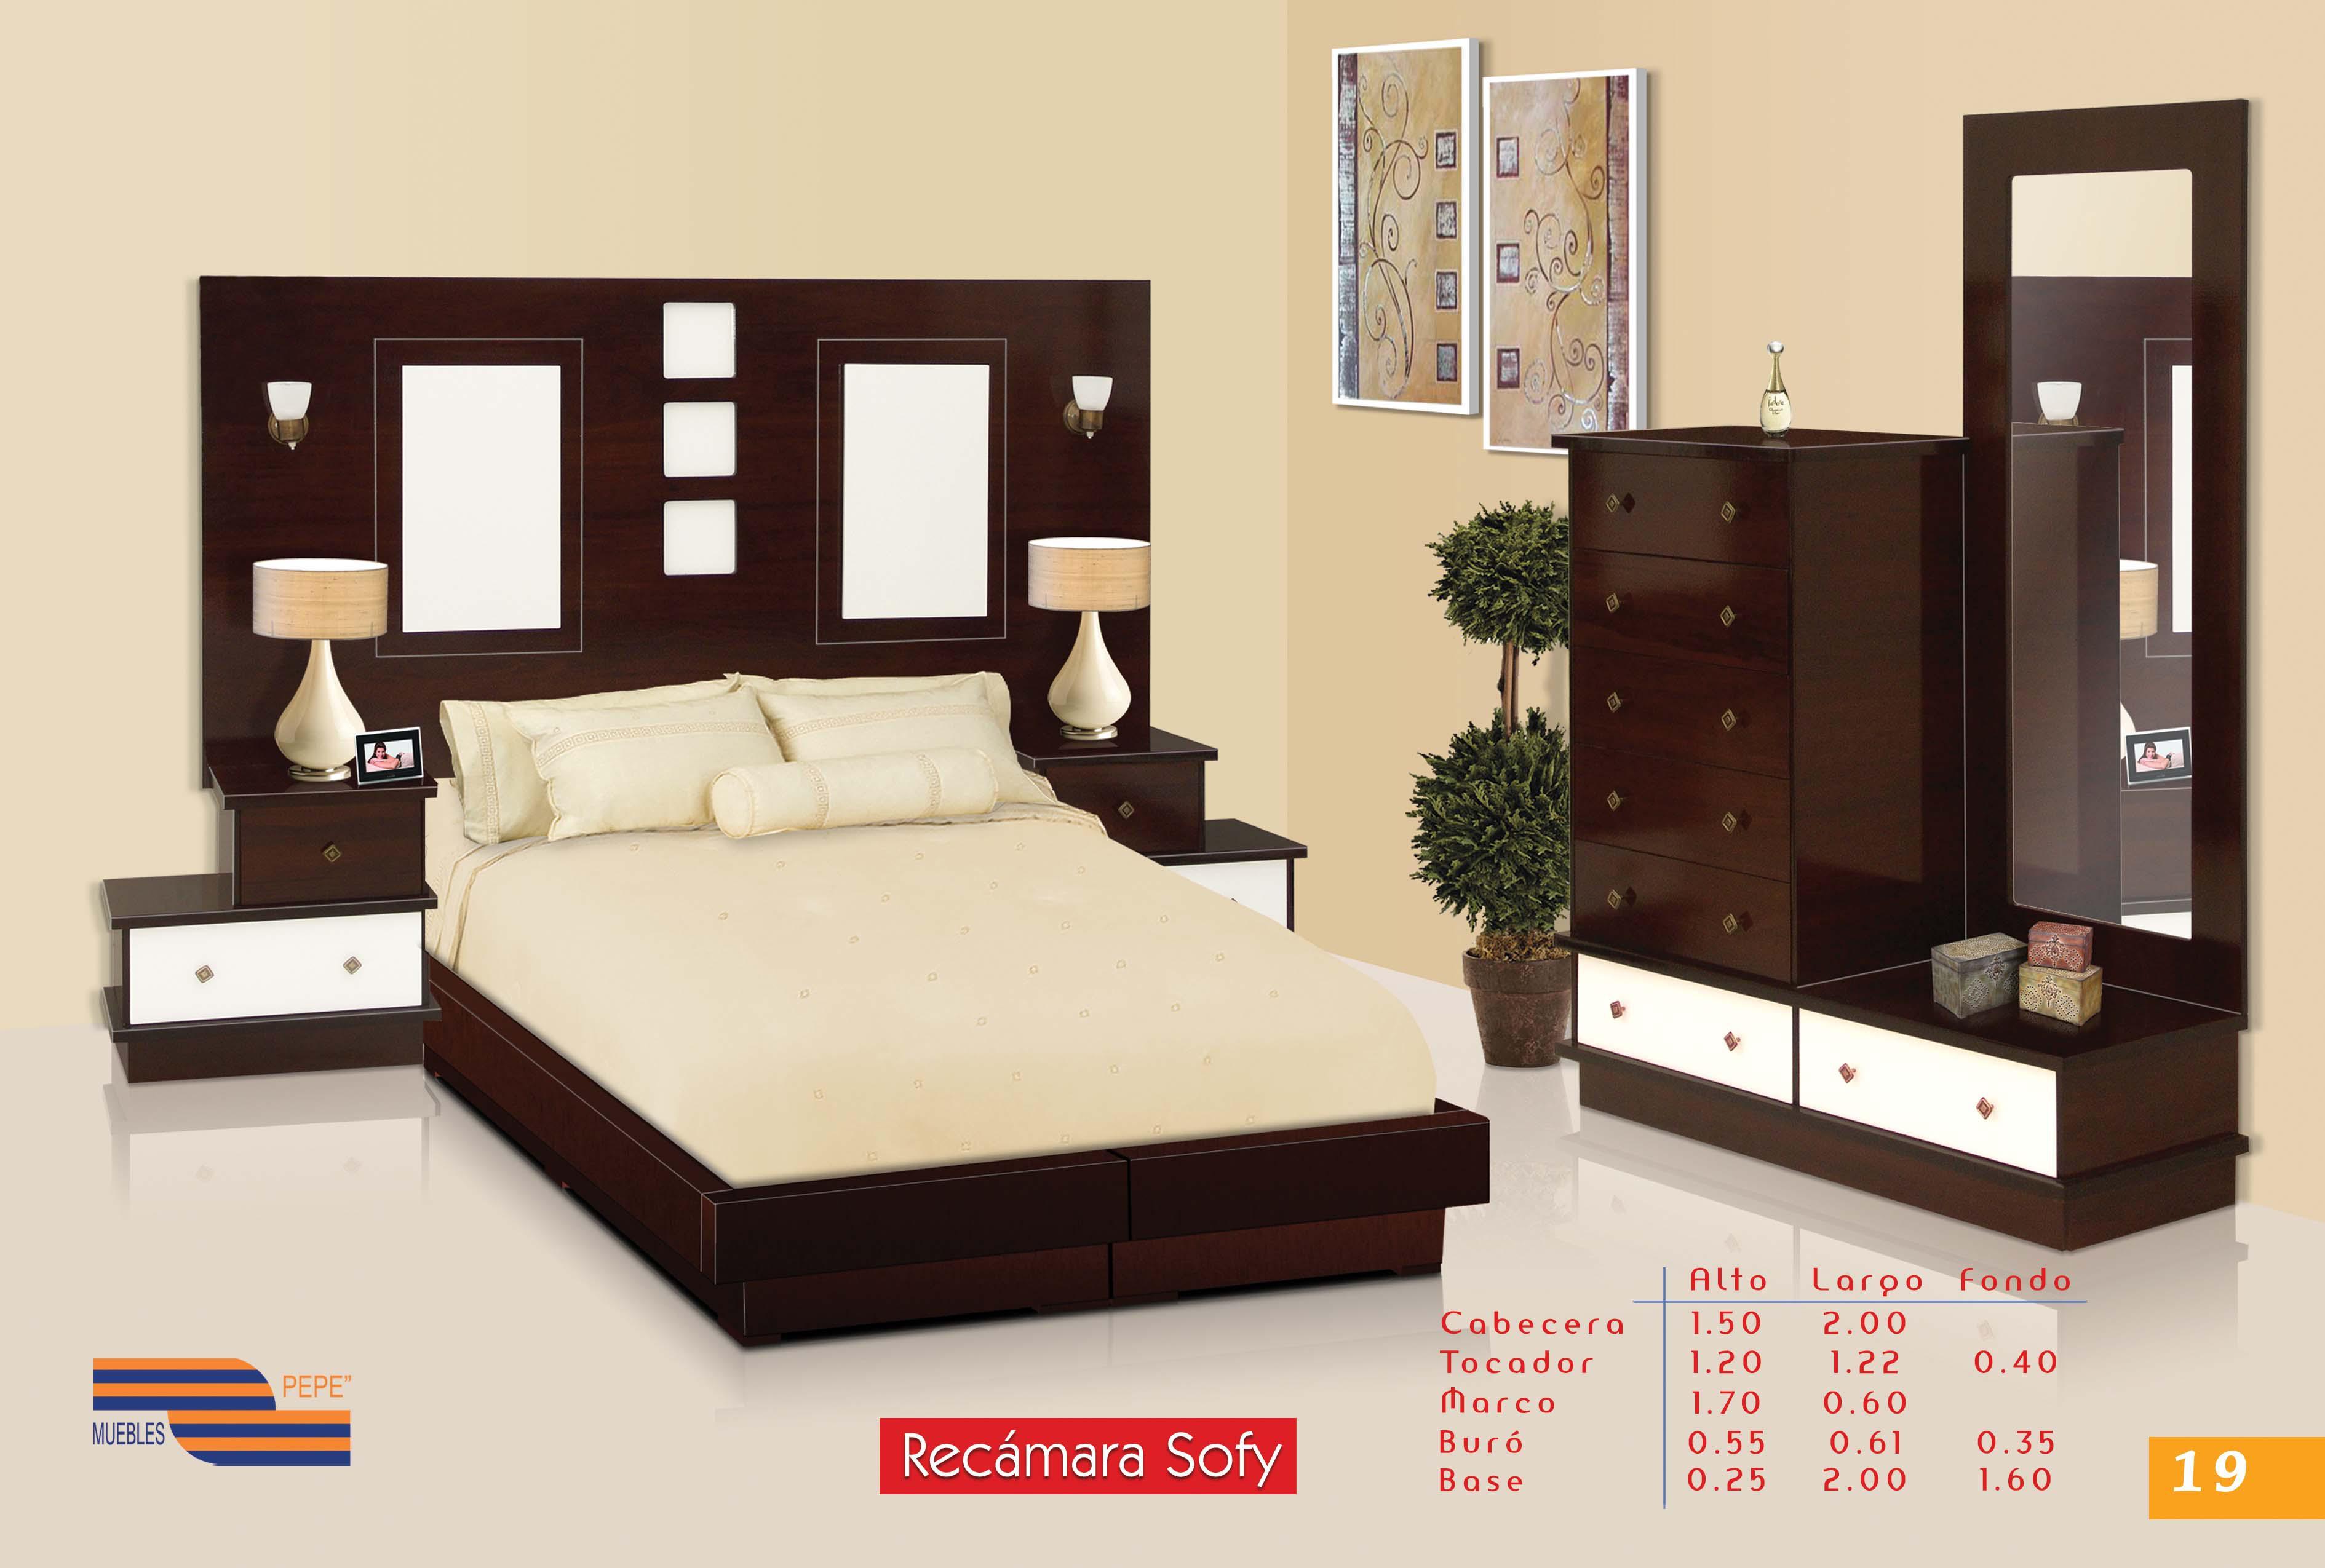 Recamara king size mod sofy jgo 5 pzas for Recamaras king size economicas